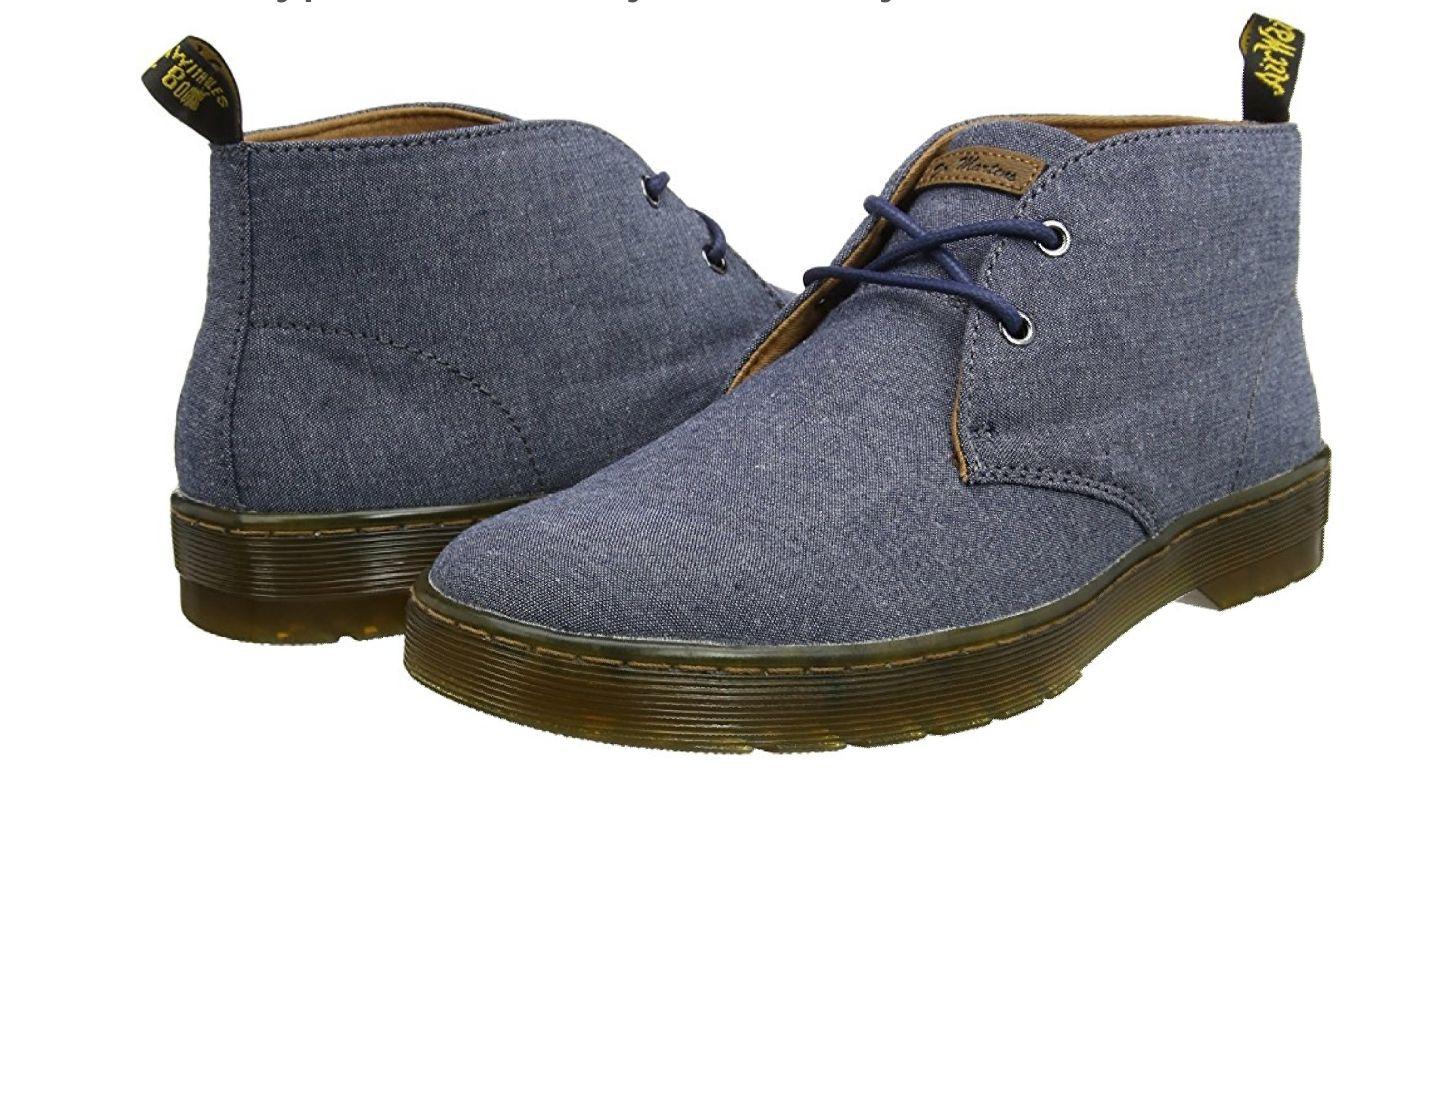 Dr. Martens True Navy Desert Boots £30 Amazon Prime. UK Sizes [6] [6.5] [7] [8]